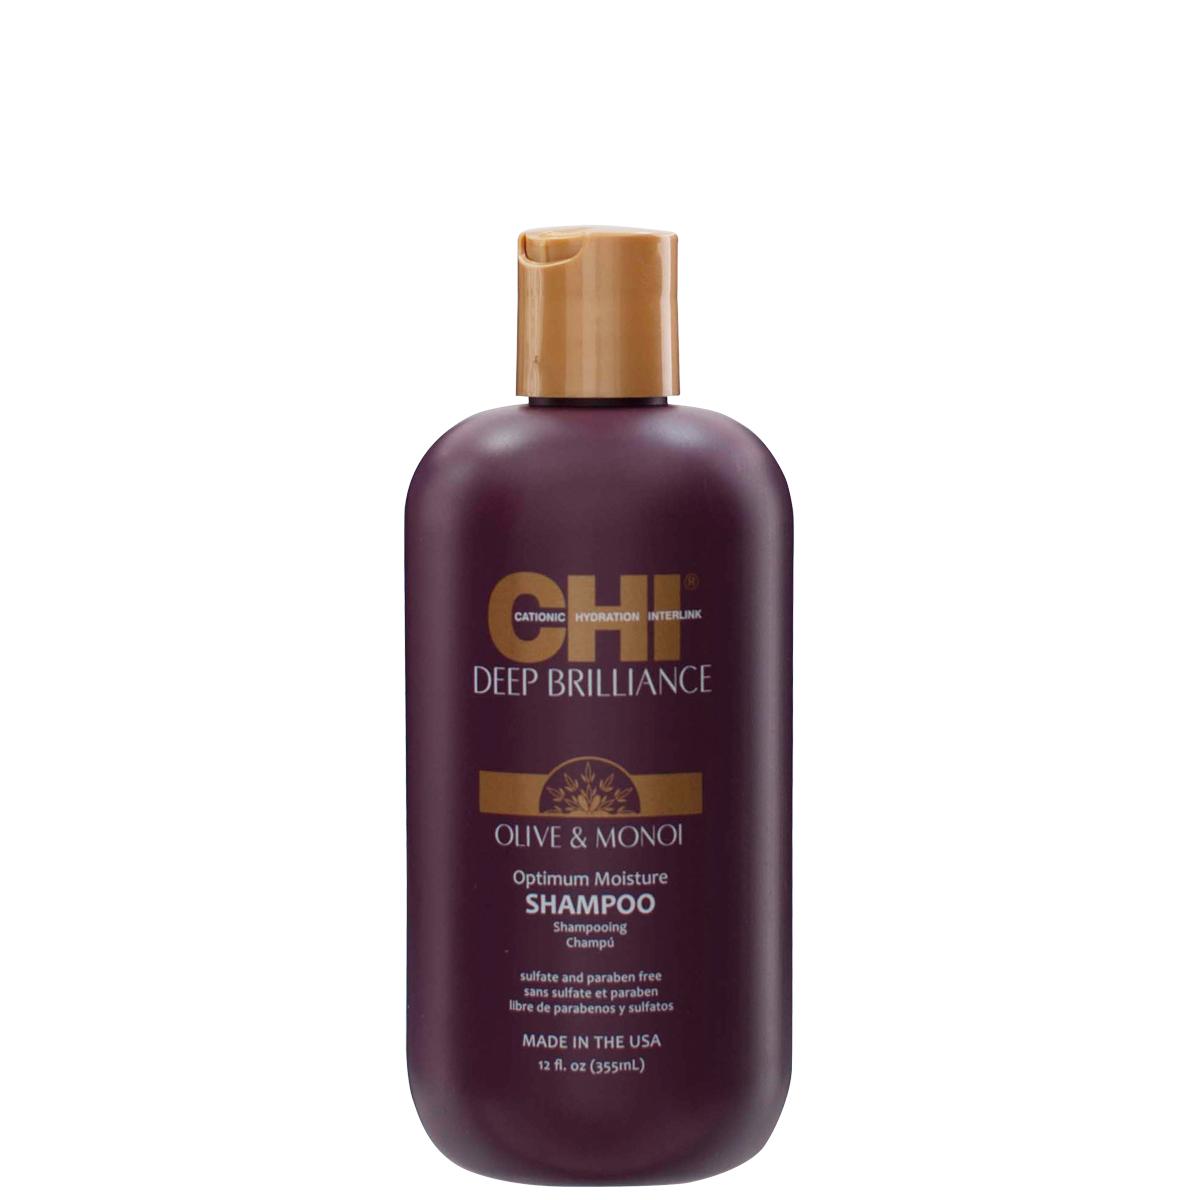 CHI Deep Brilliance Olive & Monoi Optimum Moisture Shampoo - optimálne hydratačný šampón, 355 ml